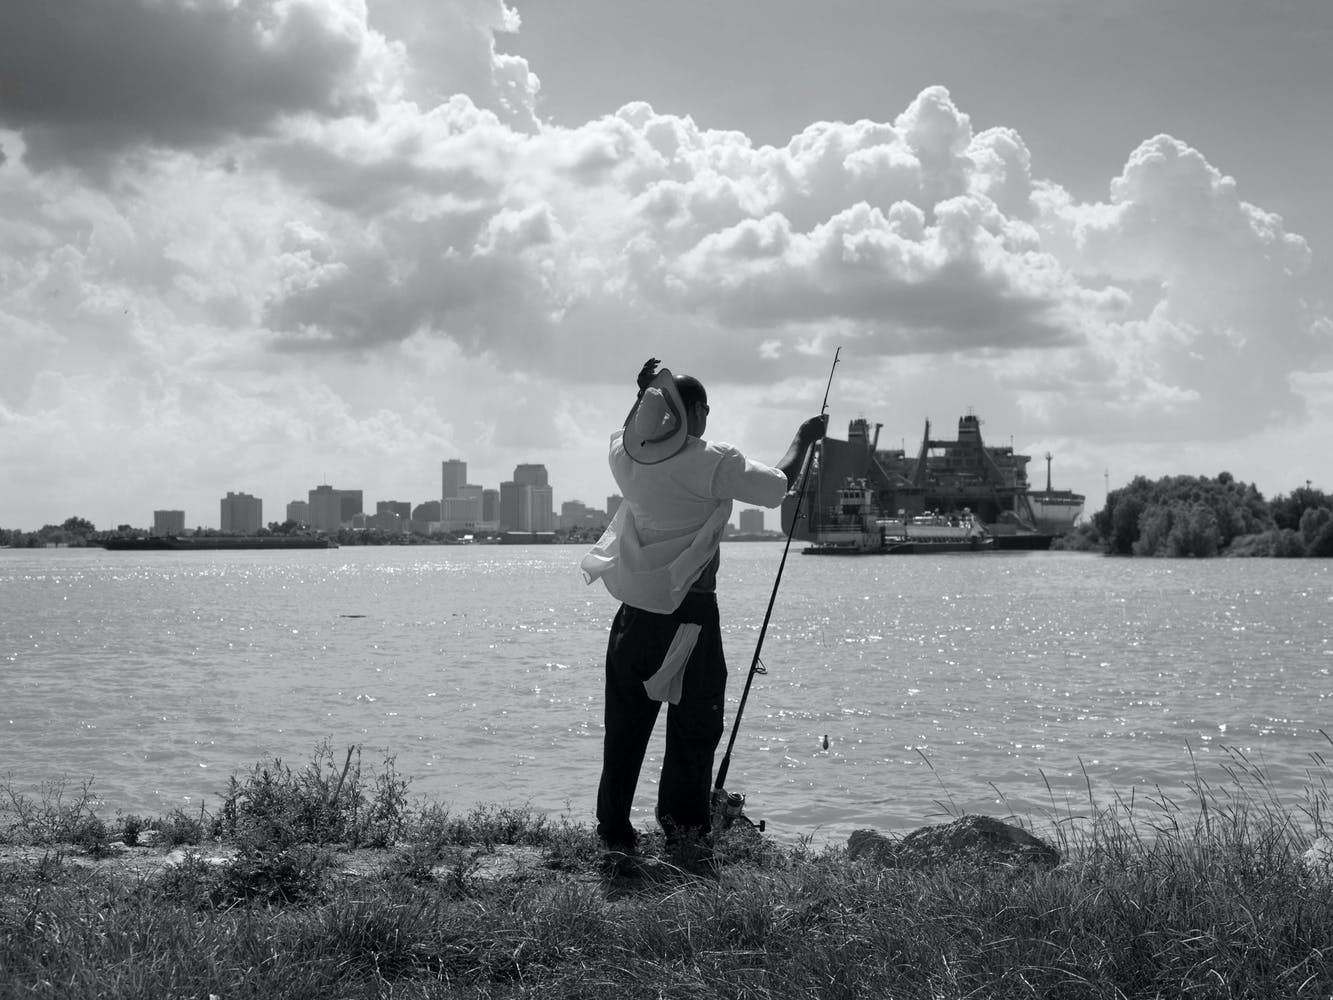 Alec Soth photo of fisherman